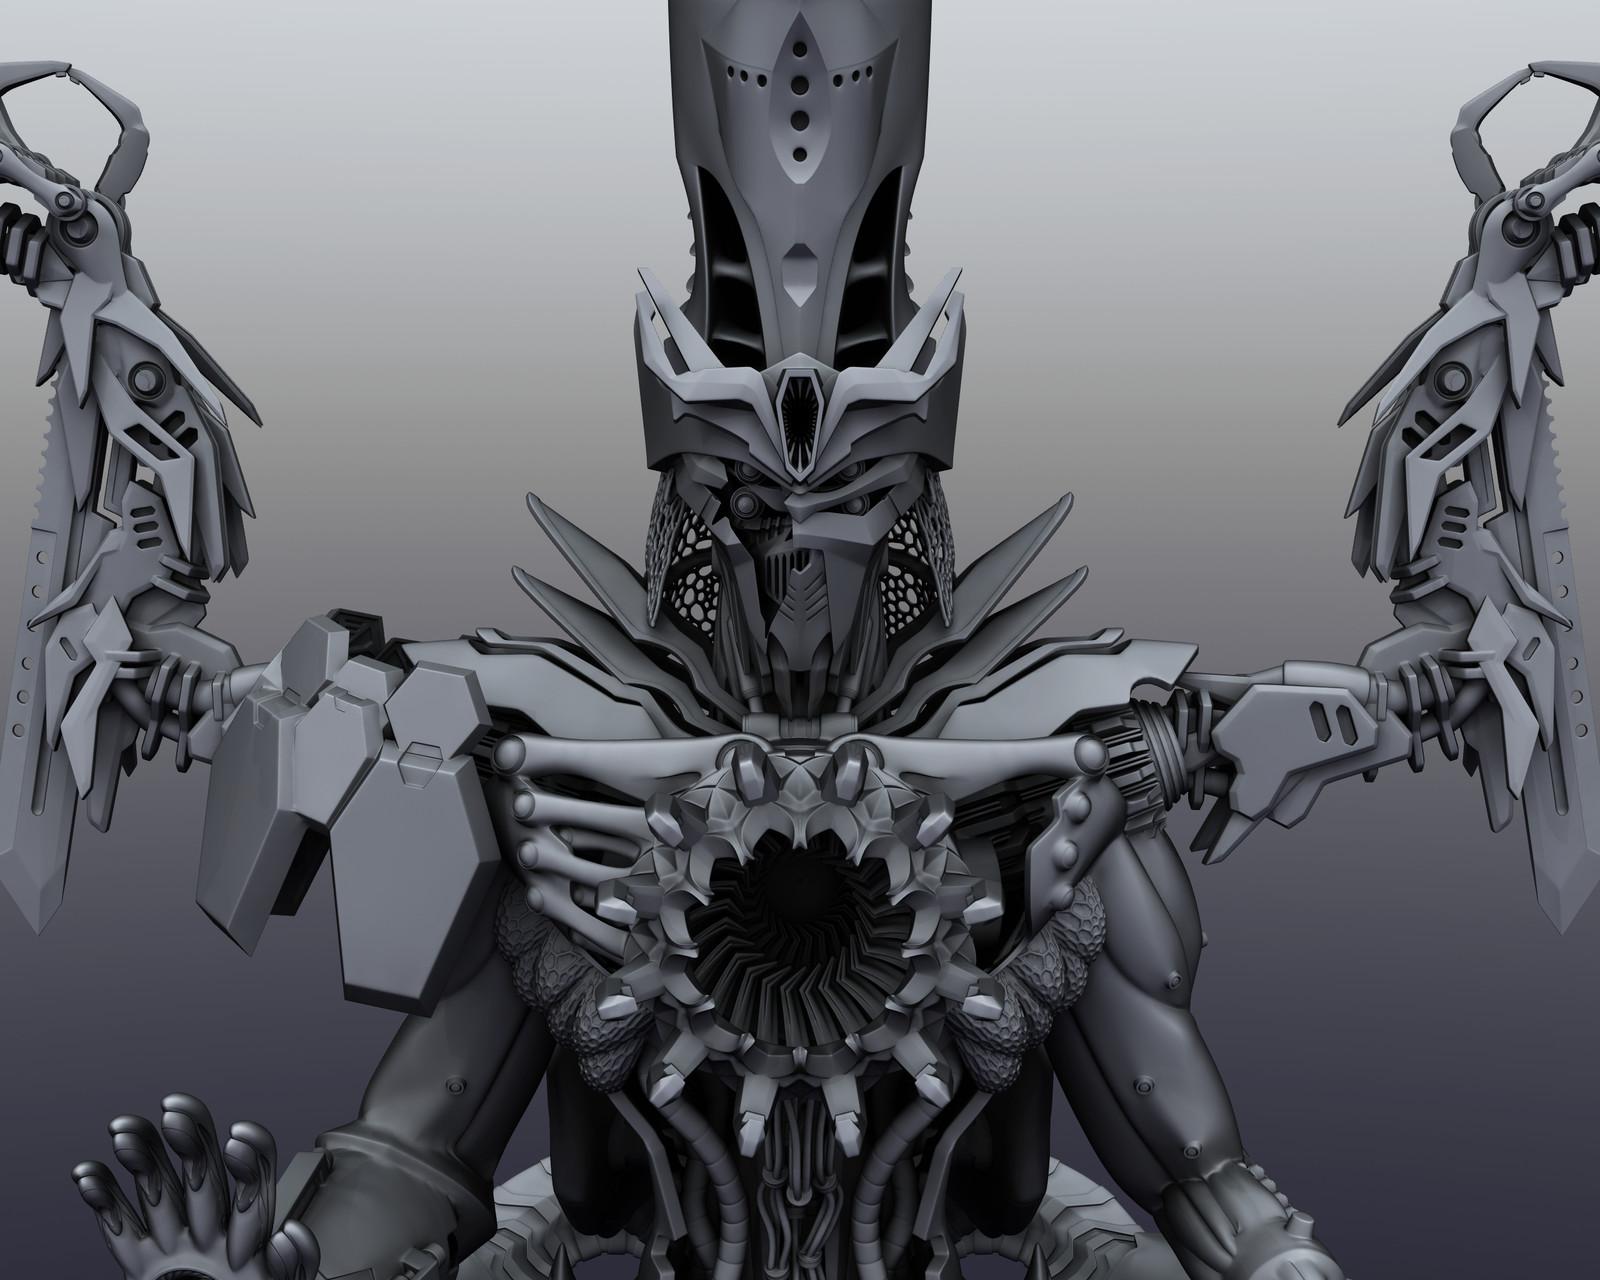 Return of the Machine God -機神再臨-